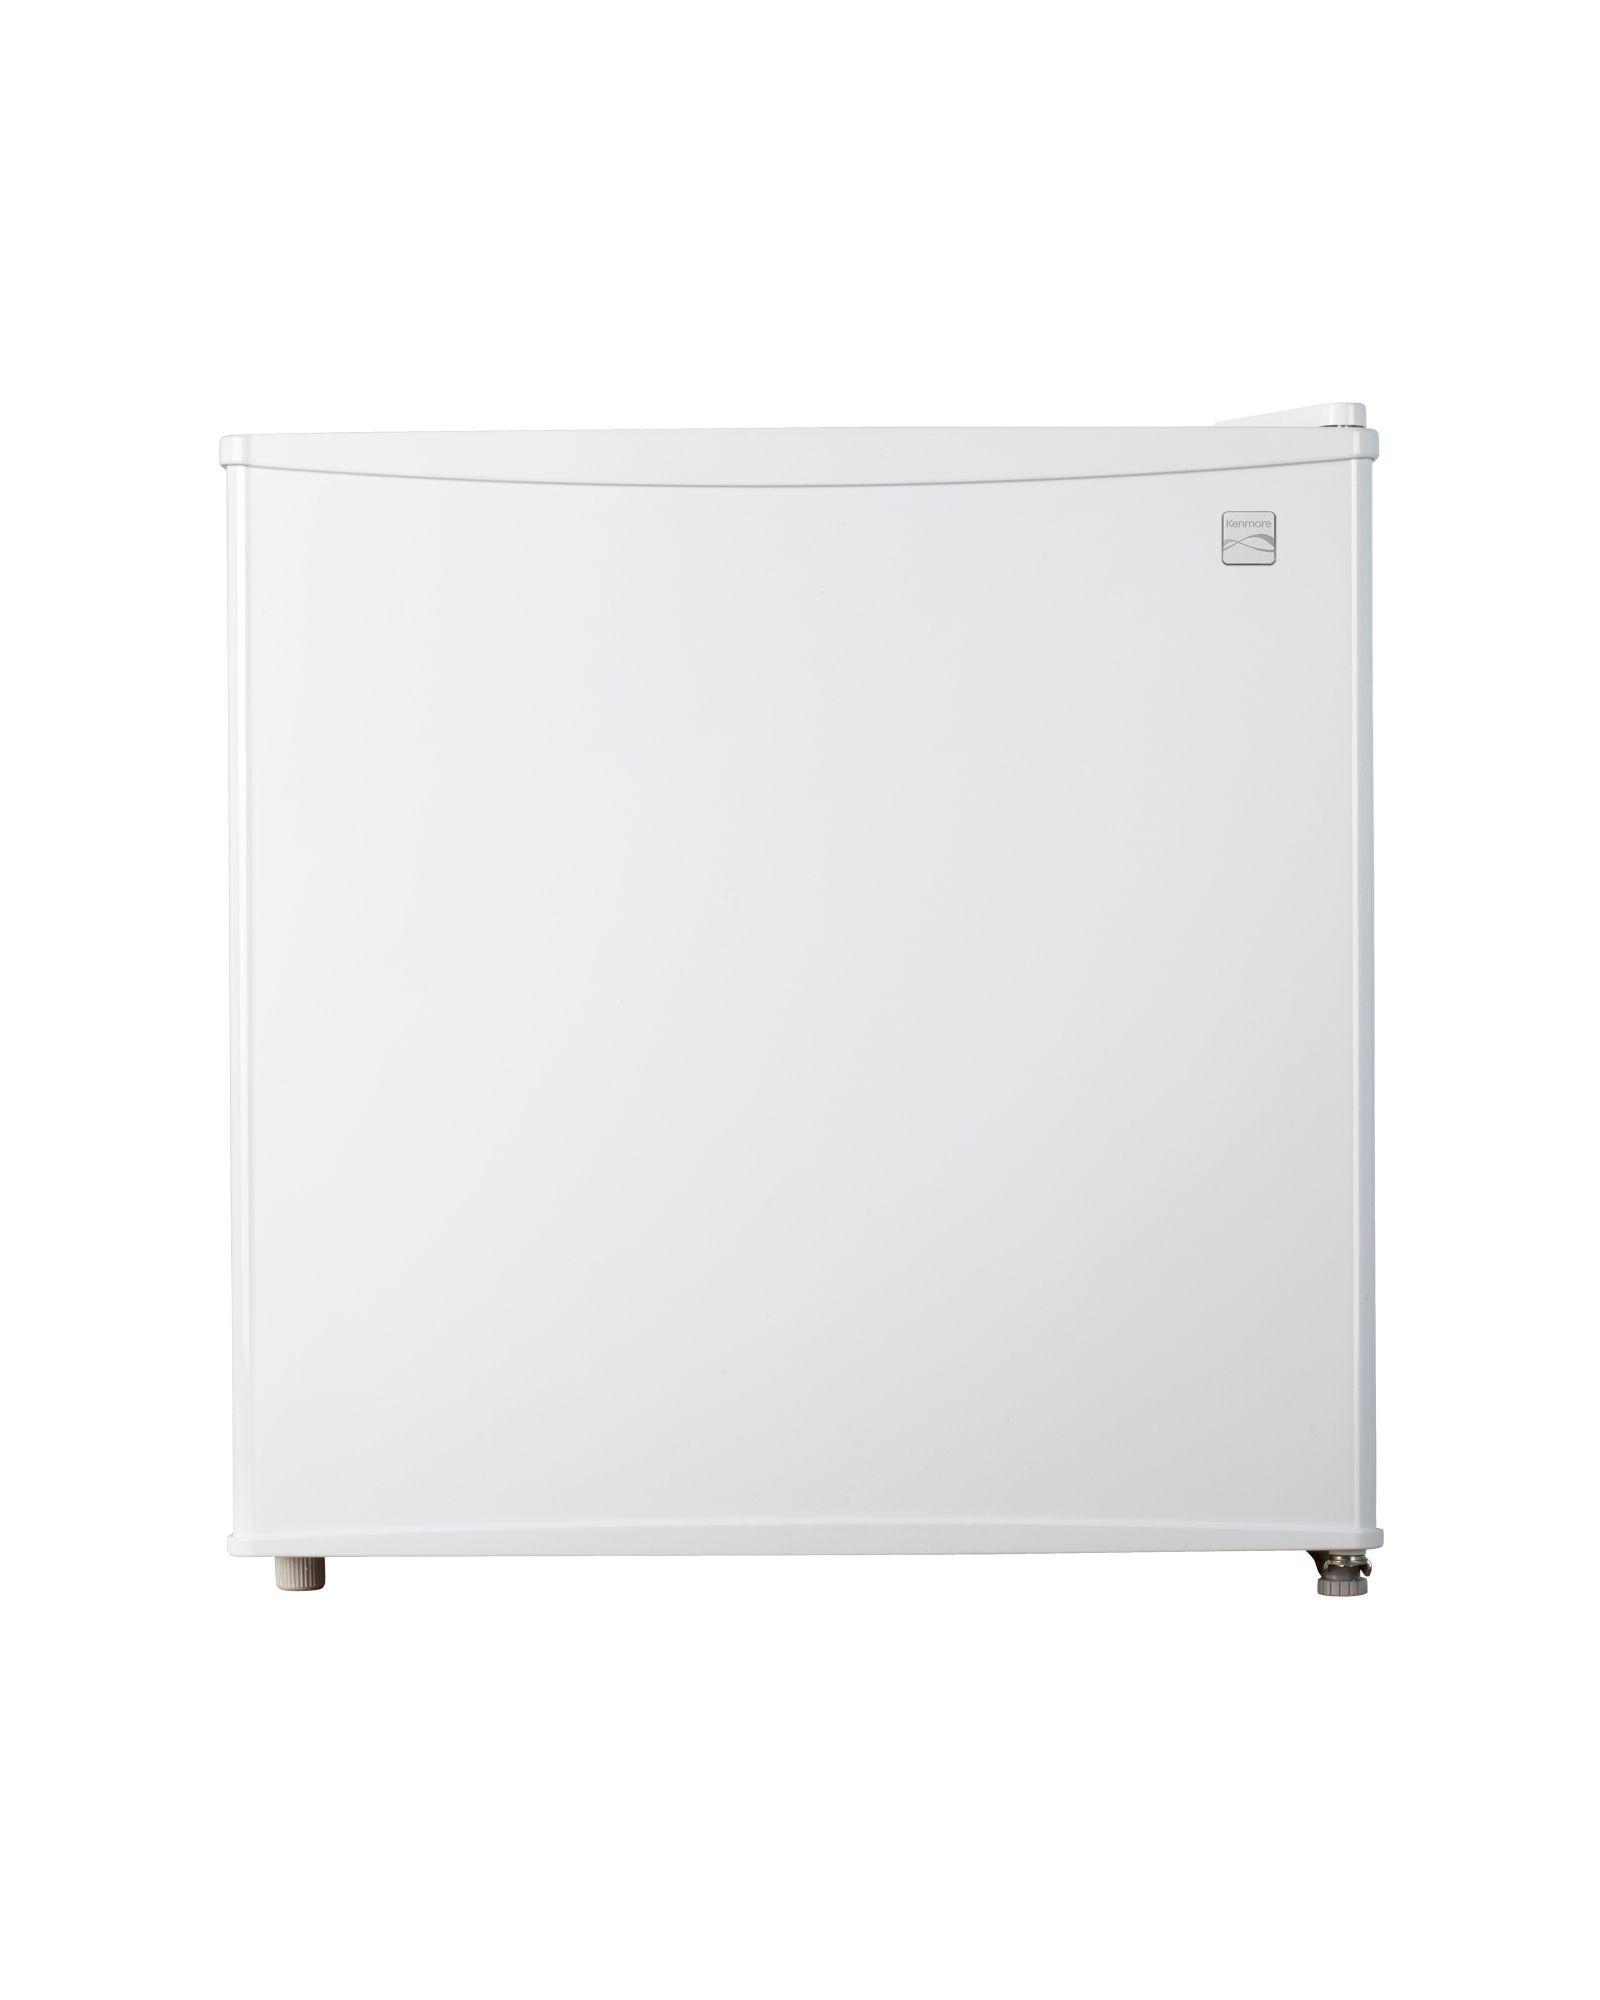 Pin on Compact Refrigerators